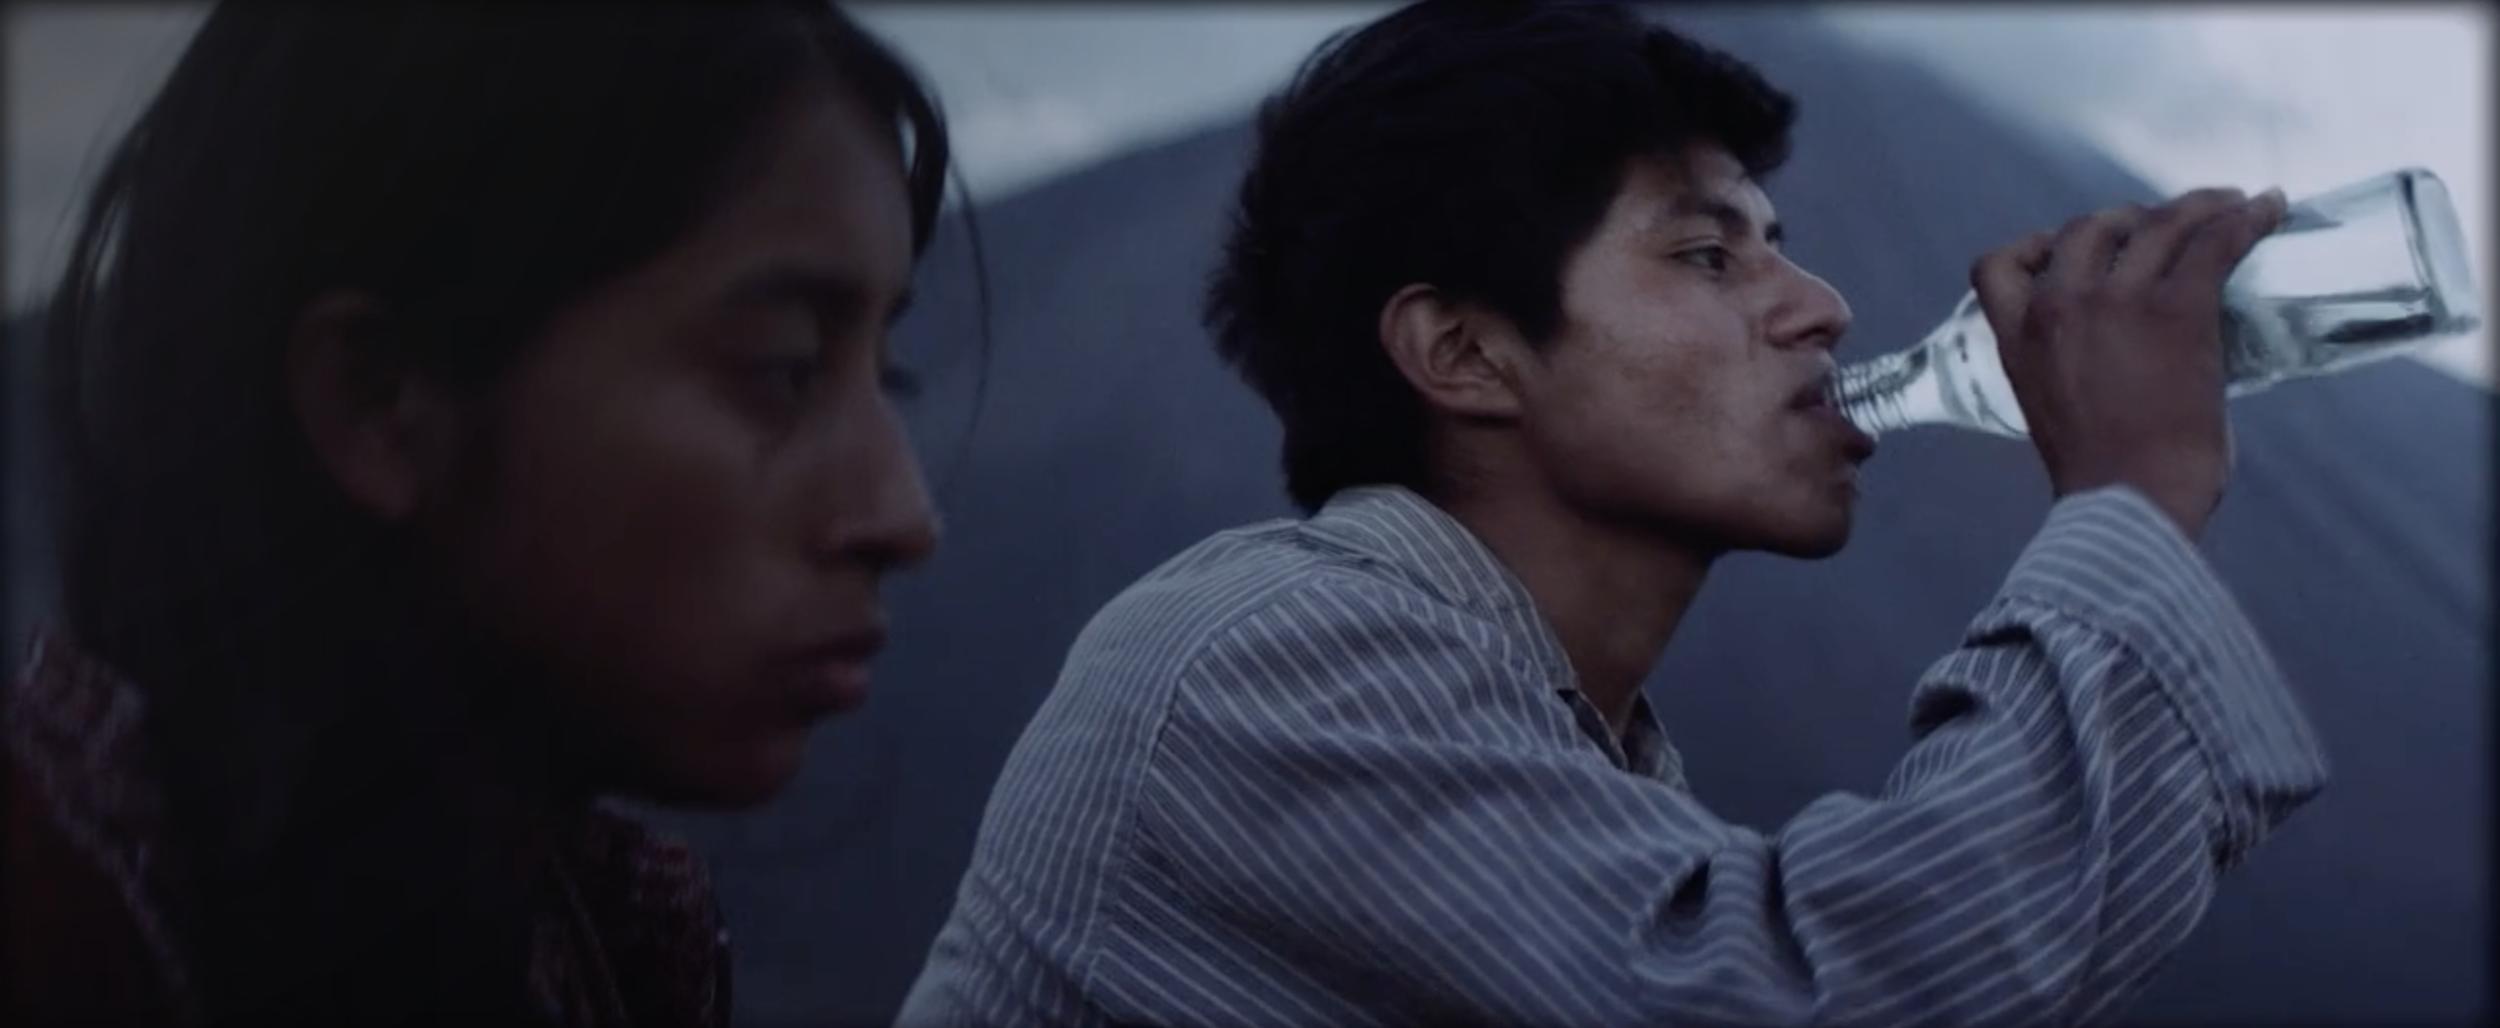 Ixcanul  , Jayro Bustamante (2015)